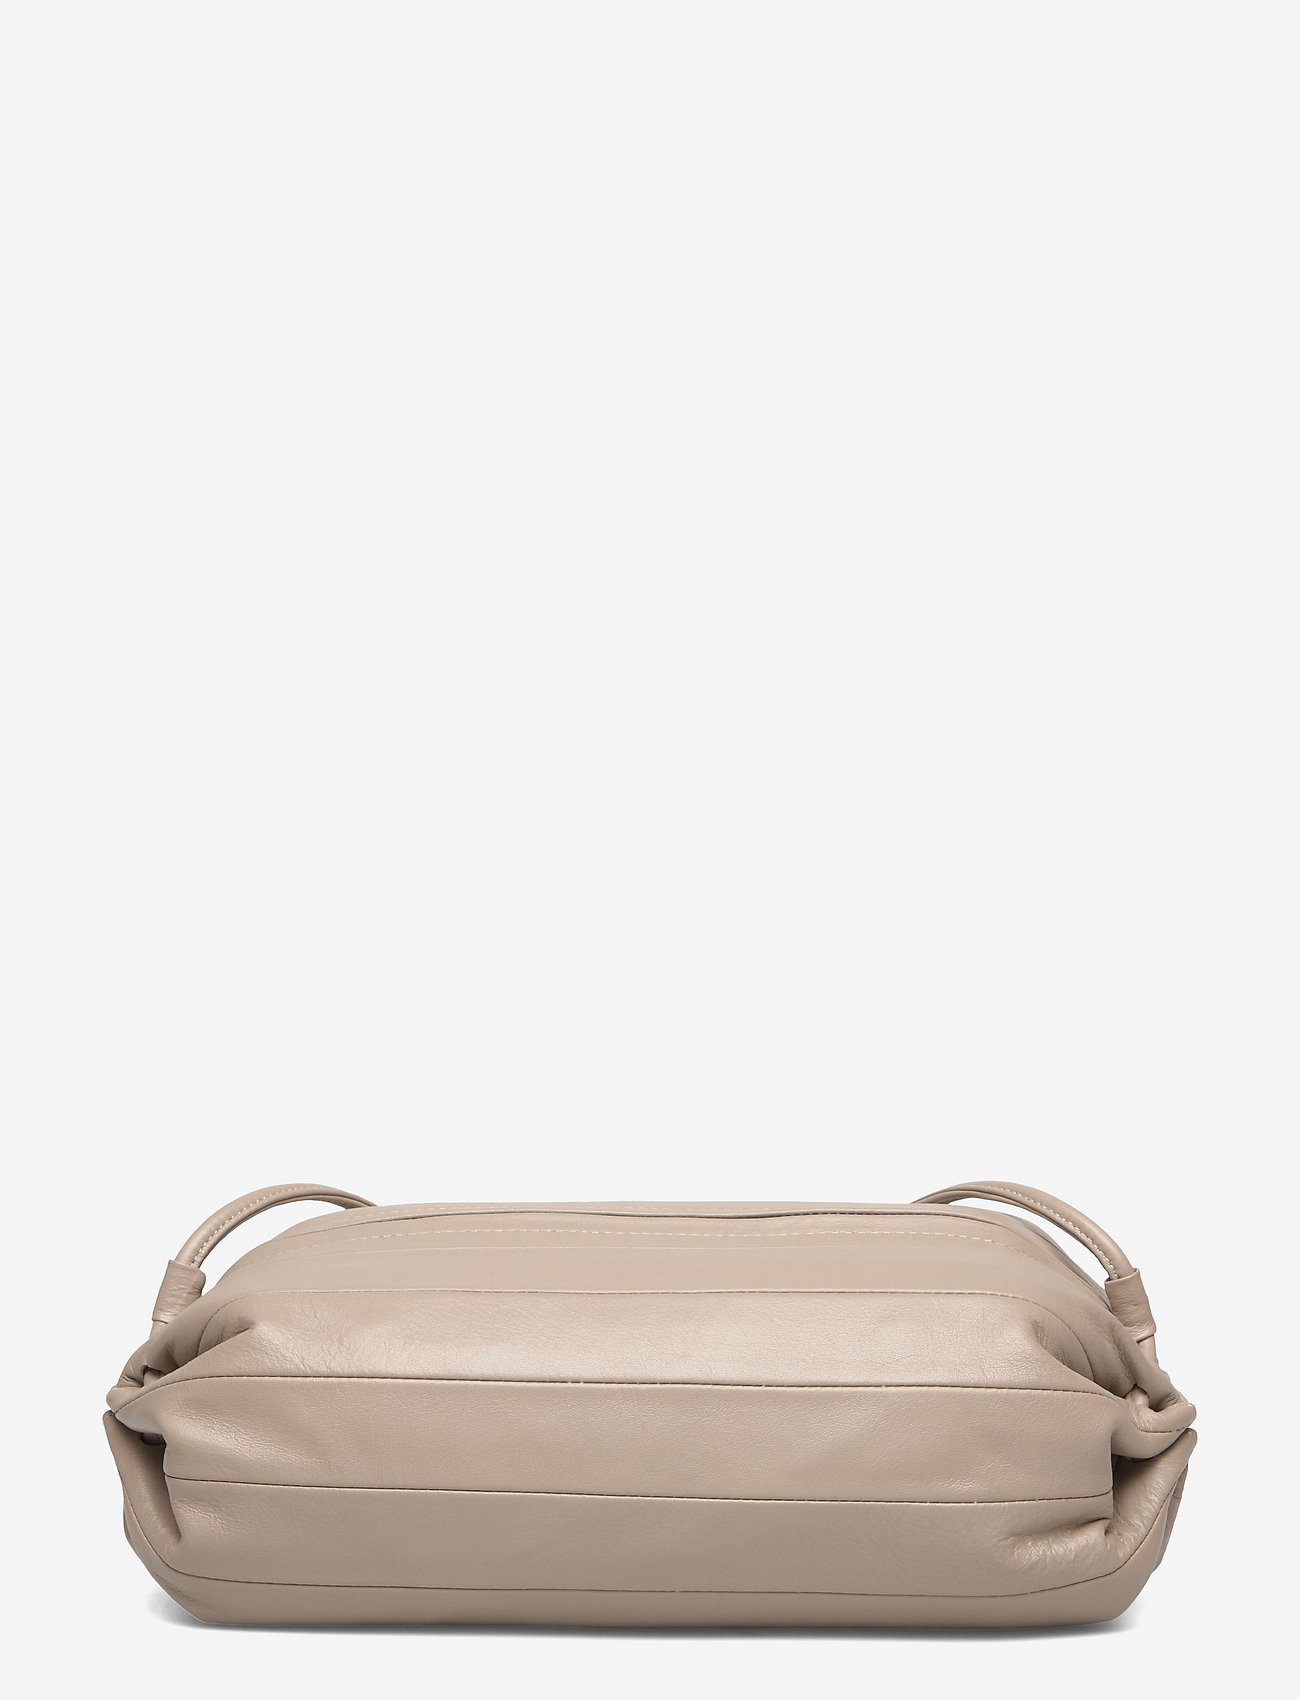 Marimekko - KARLA BAG - crossbody bags - taupe - 1